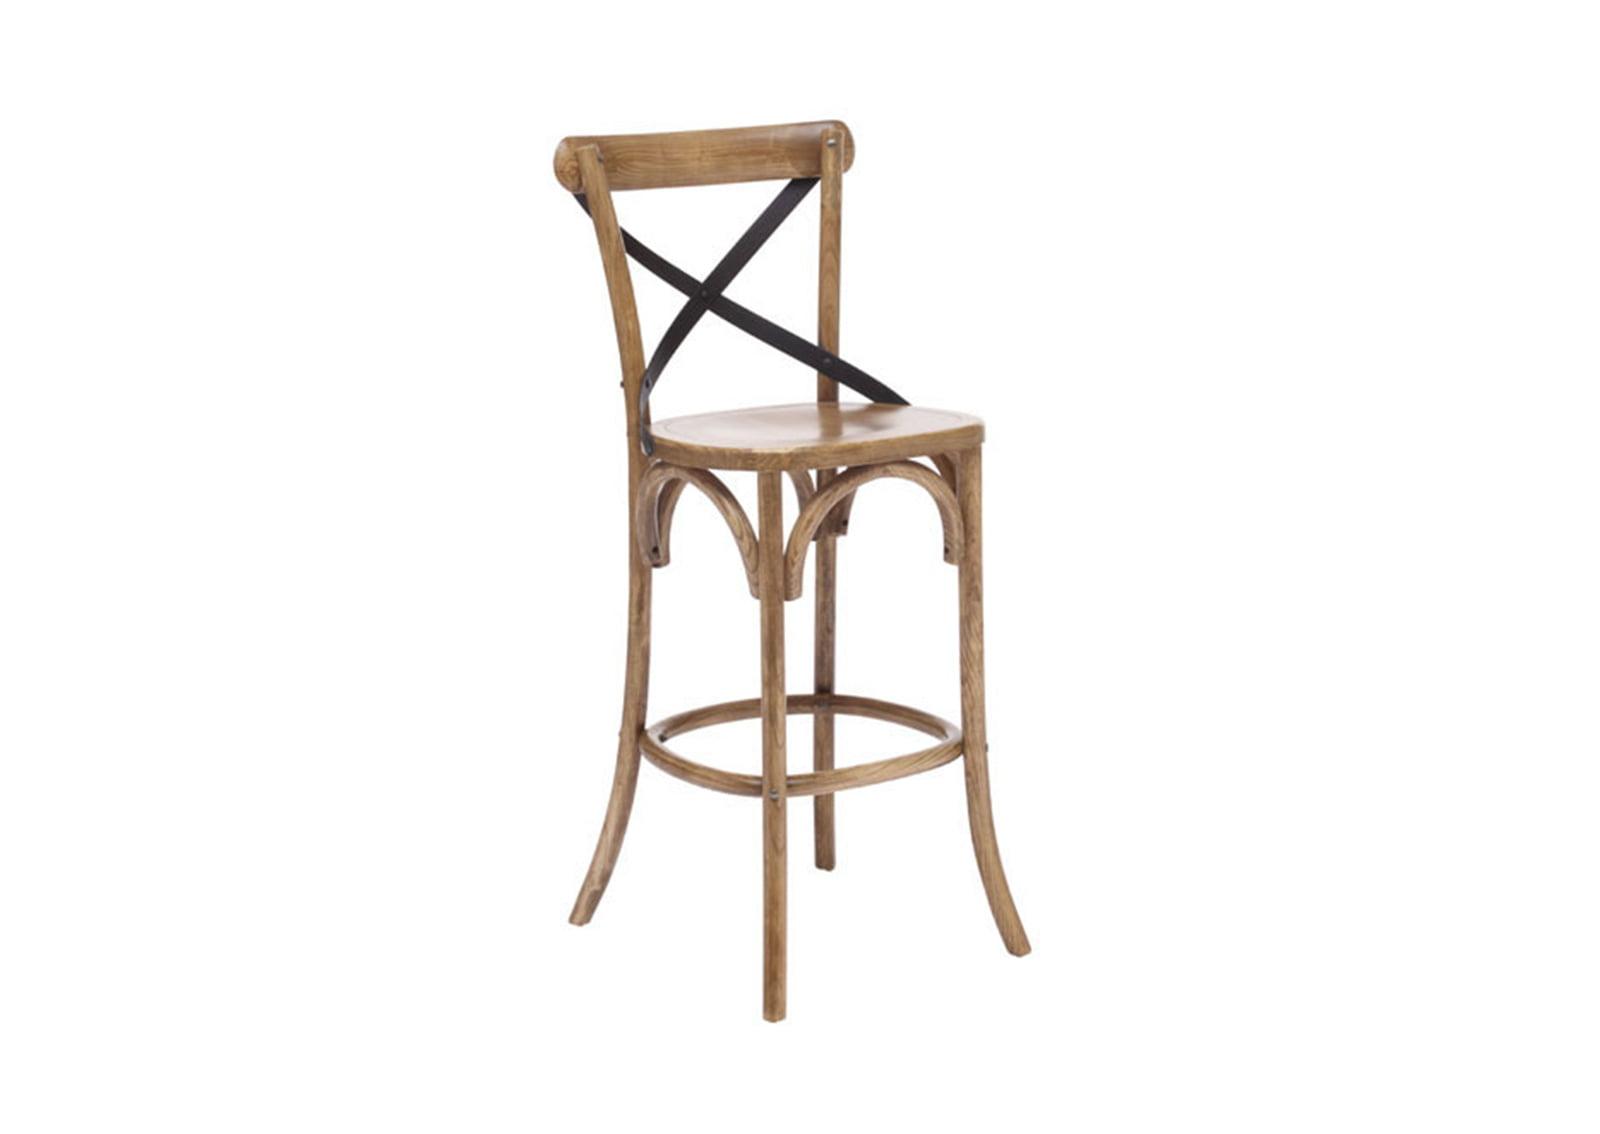 Union Square Bar Chair Furnishplus